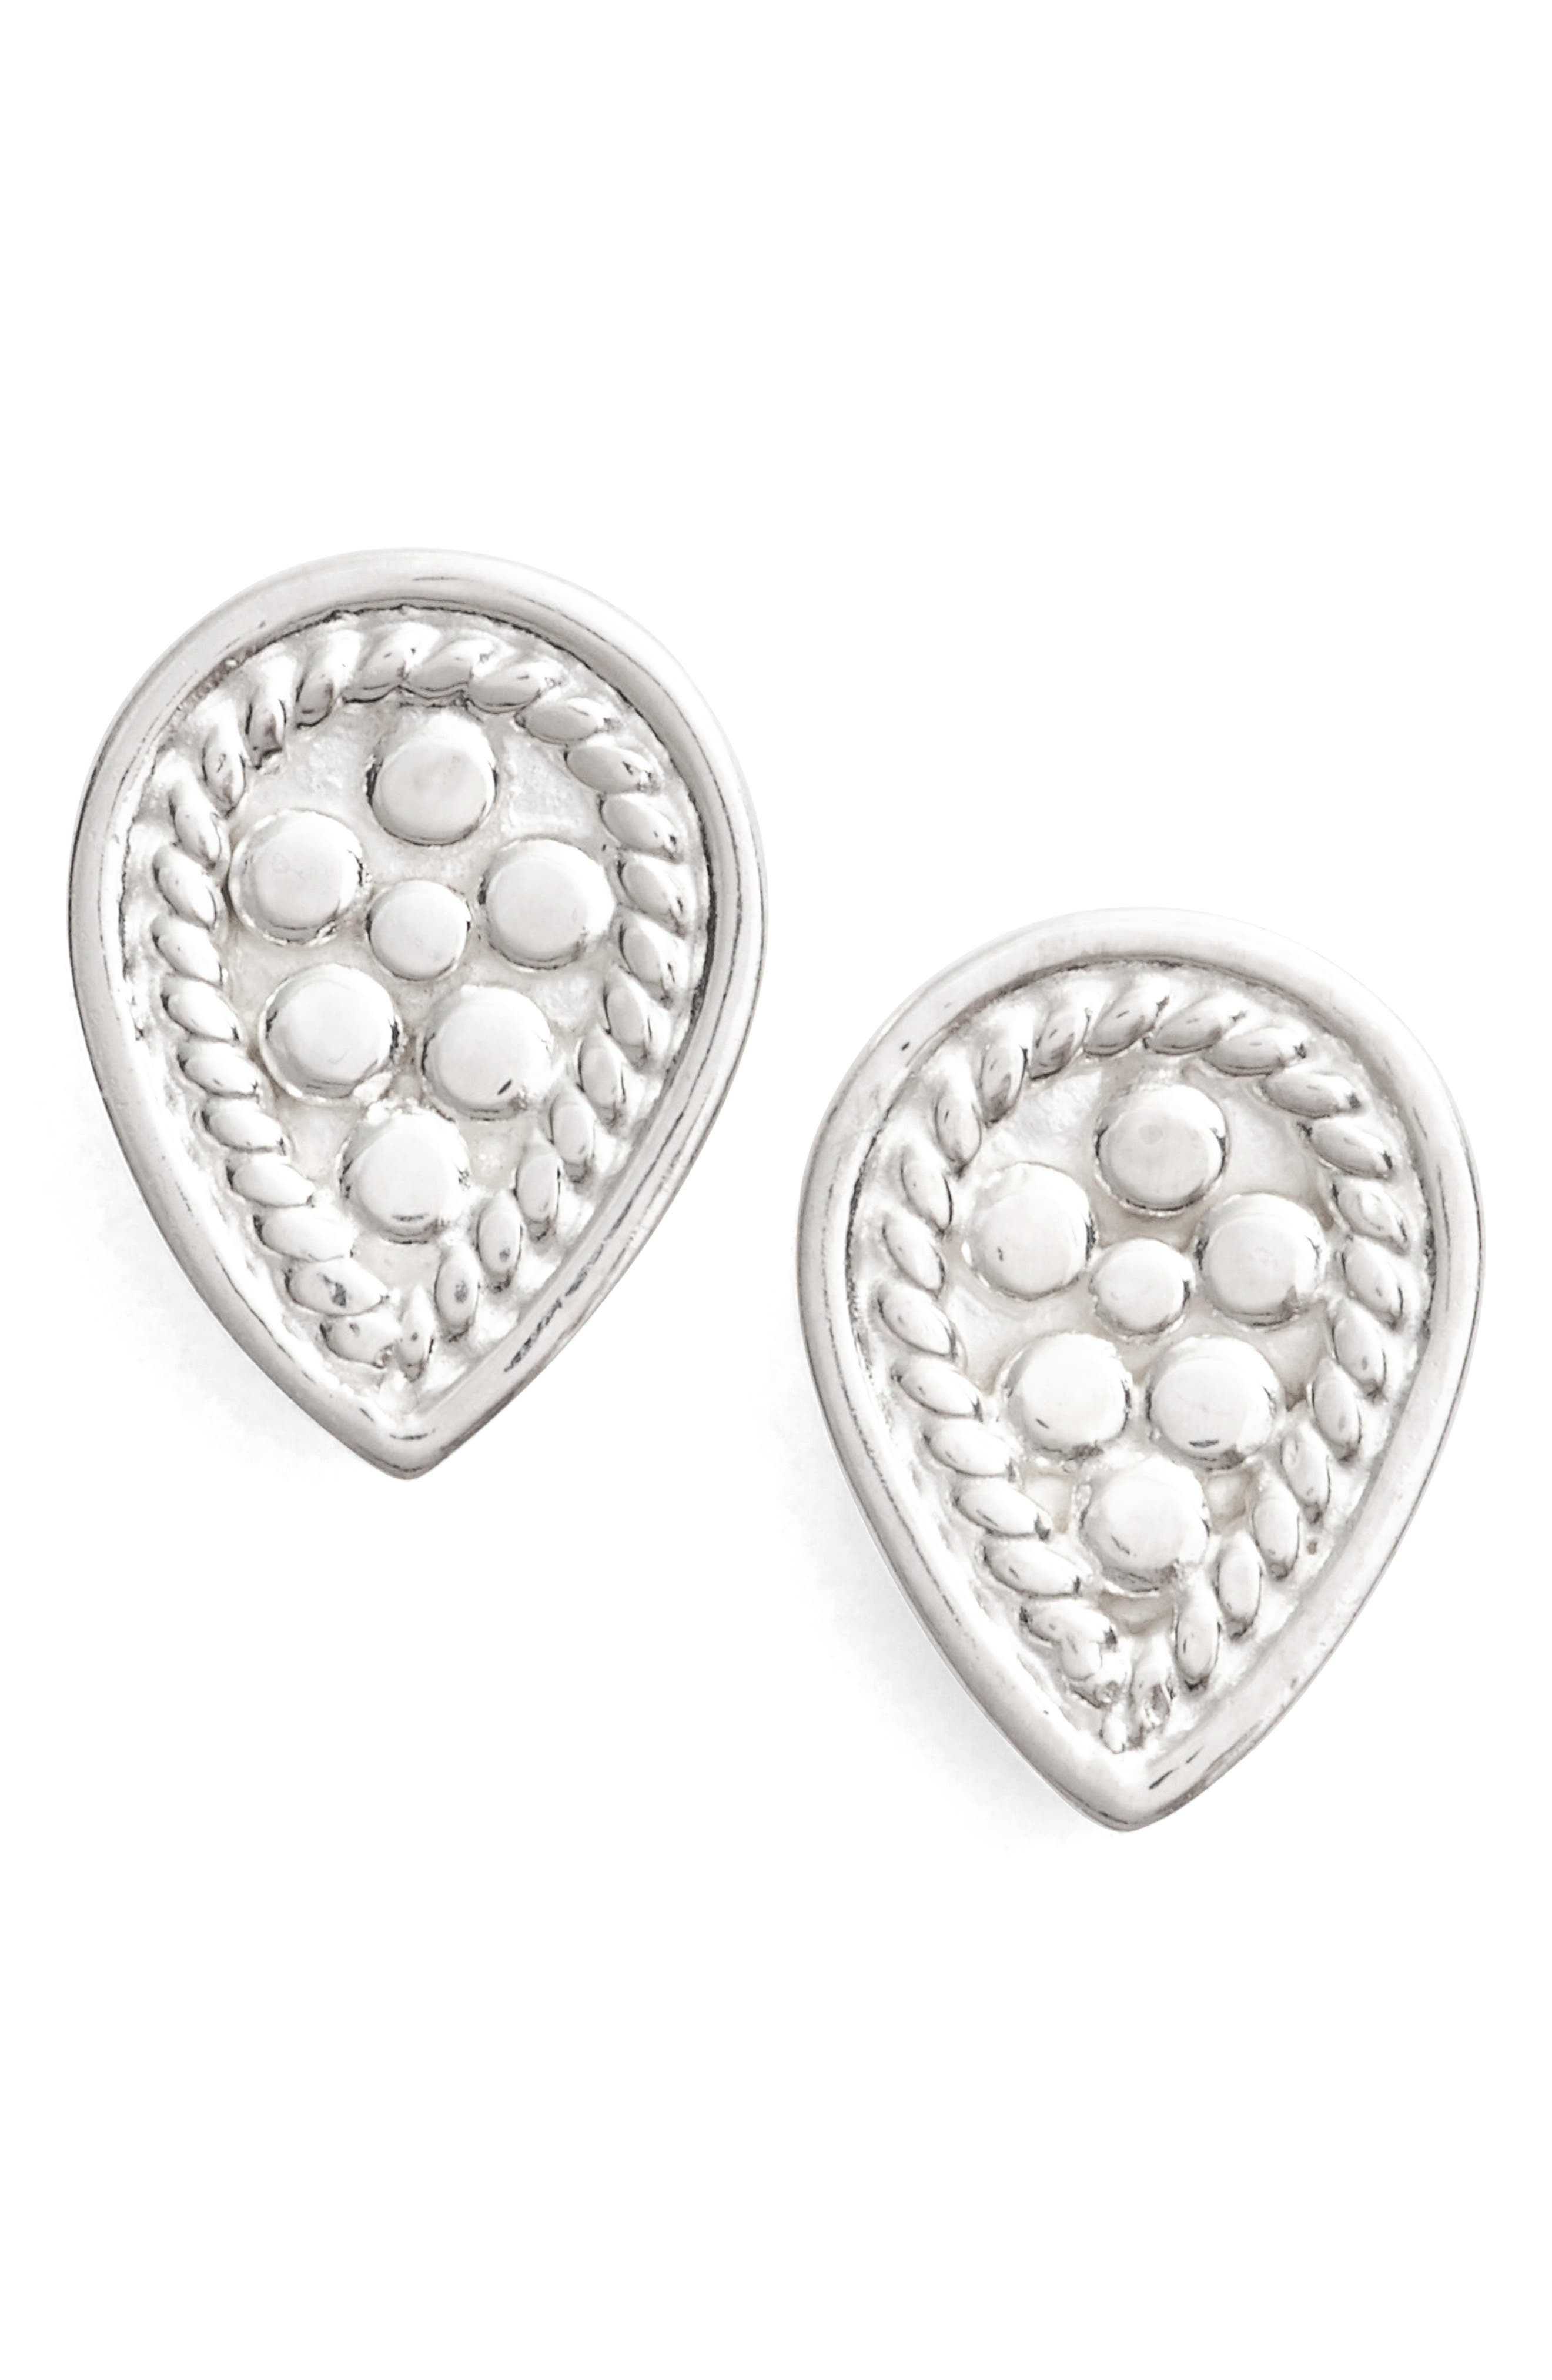 ANNA BECK Teardrop Stud Earrings